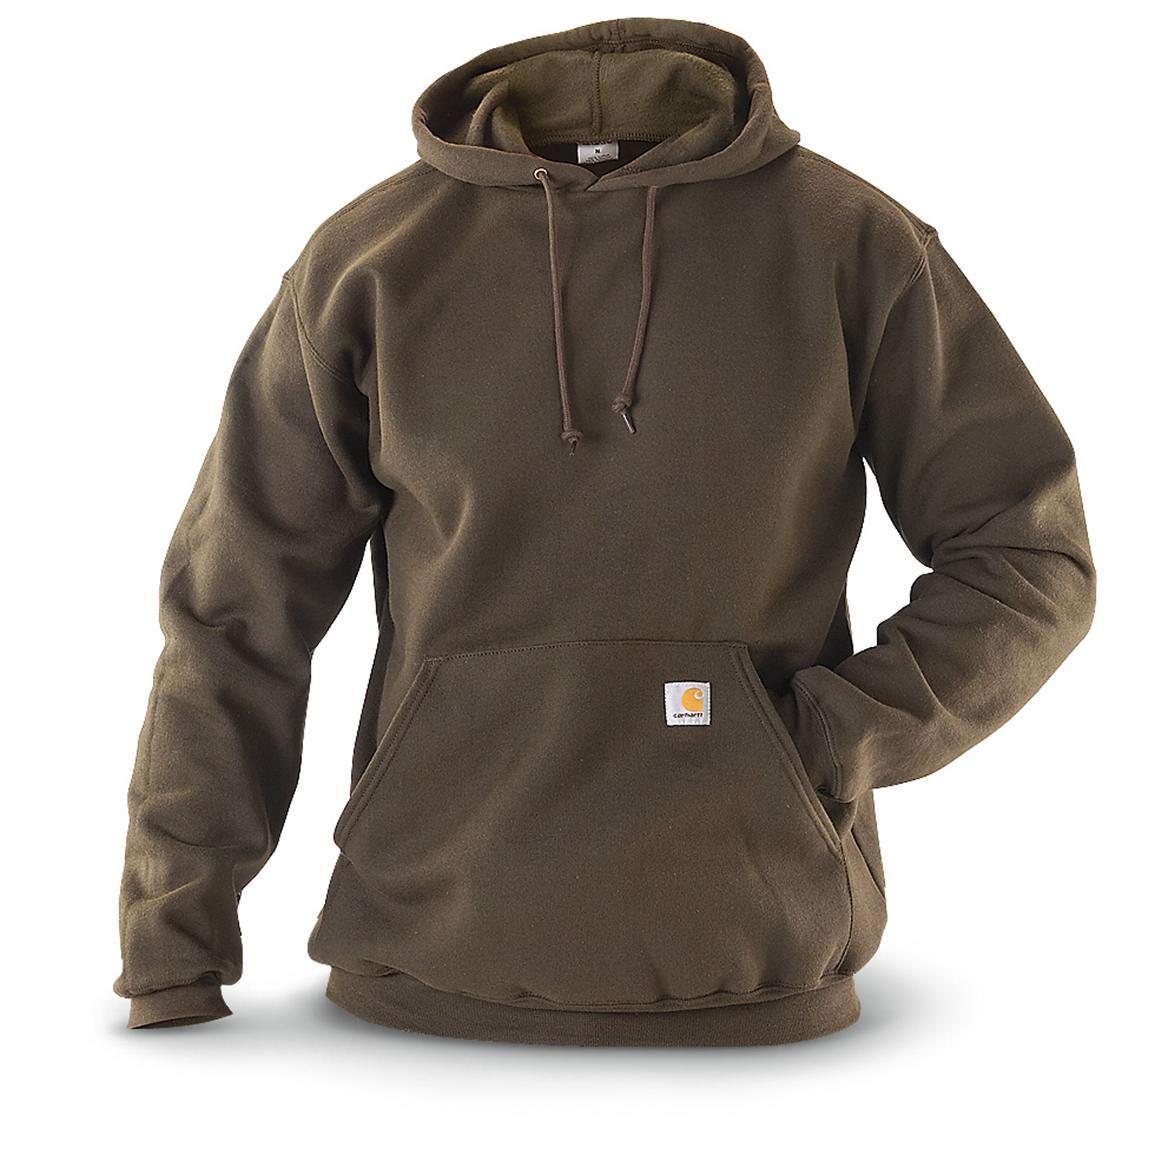 Carhartt Men S Midweight Hooded Pullover Sweatshirt 228226 Sweatshirts Hoodies At Sportsman S Guide Carhartt Sweatshirts Carhartt Mens Mens Outfits [ 1154 x 1154 Pixel ]